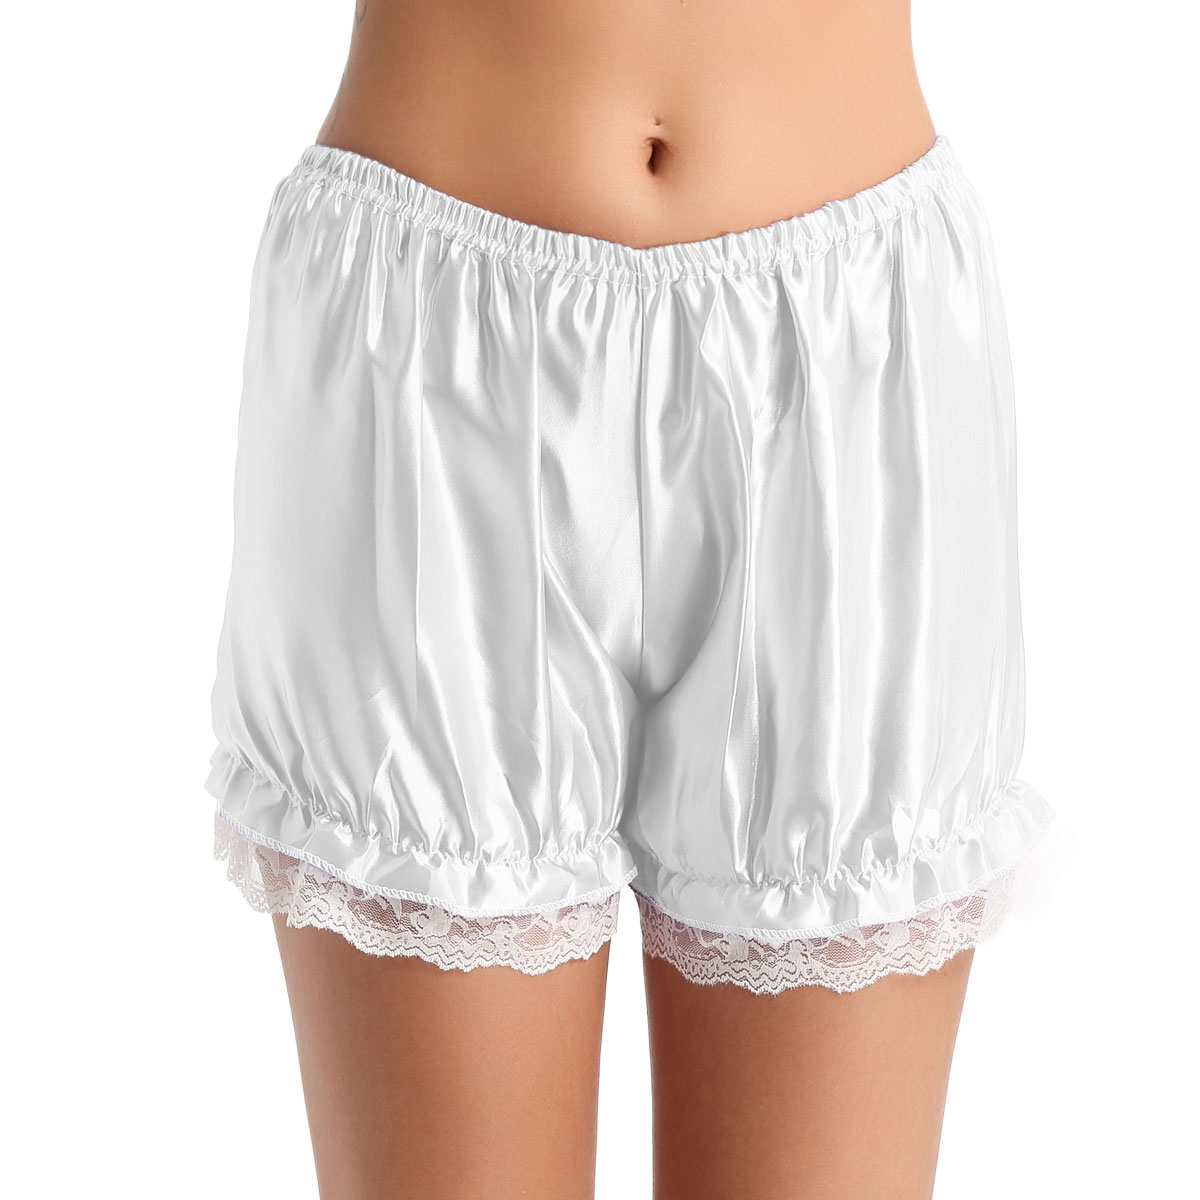 16 Years Lolita Porn us $3.87 16% off|tiaobug women girls lace hem lingerie shiny pumpkin  bloomers lolita shorts knickers security short pants sleepwear sissy